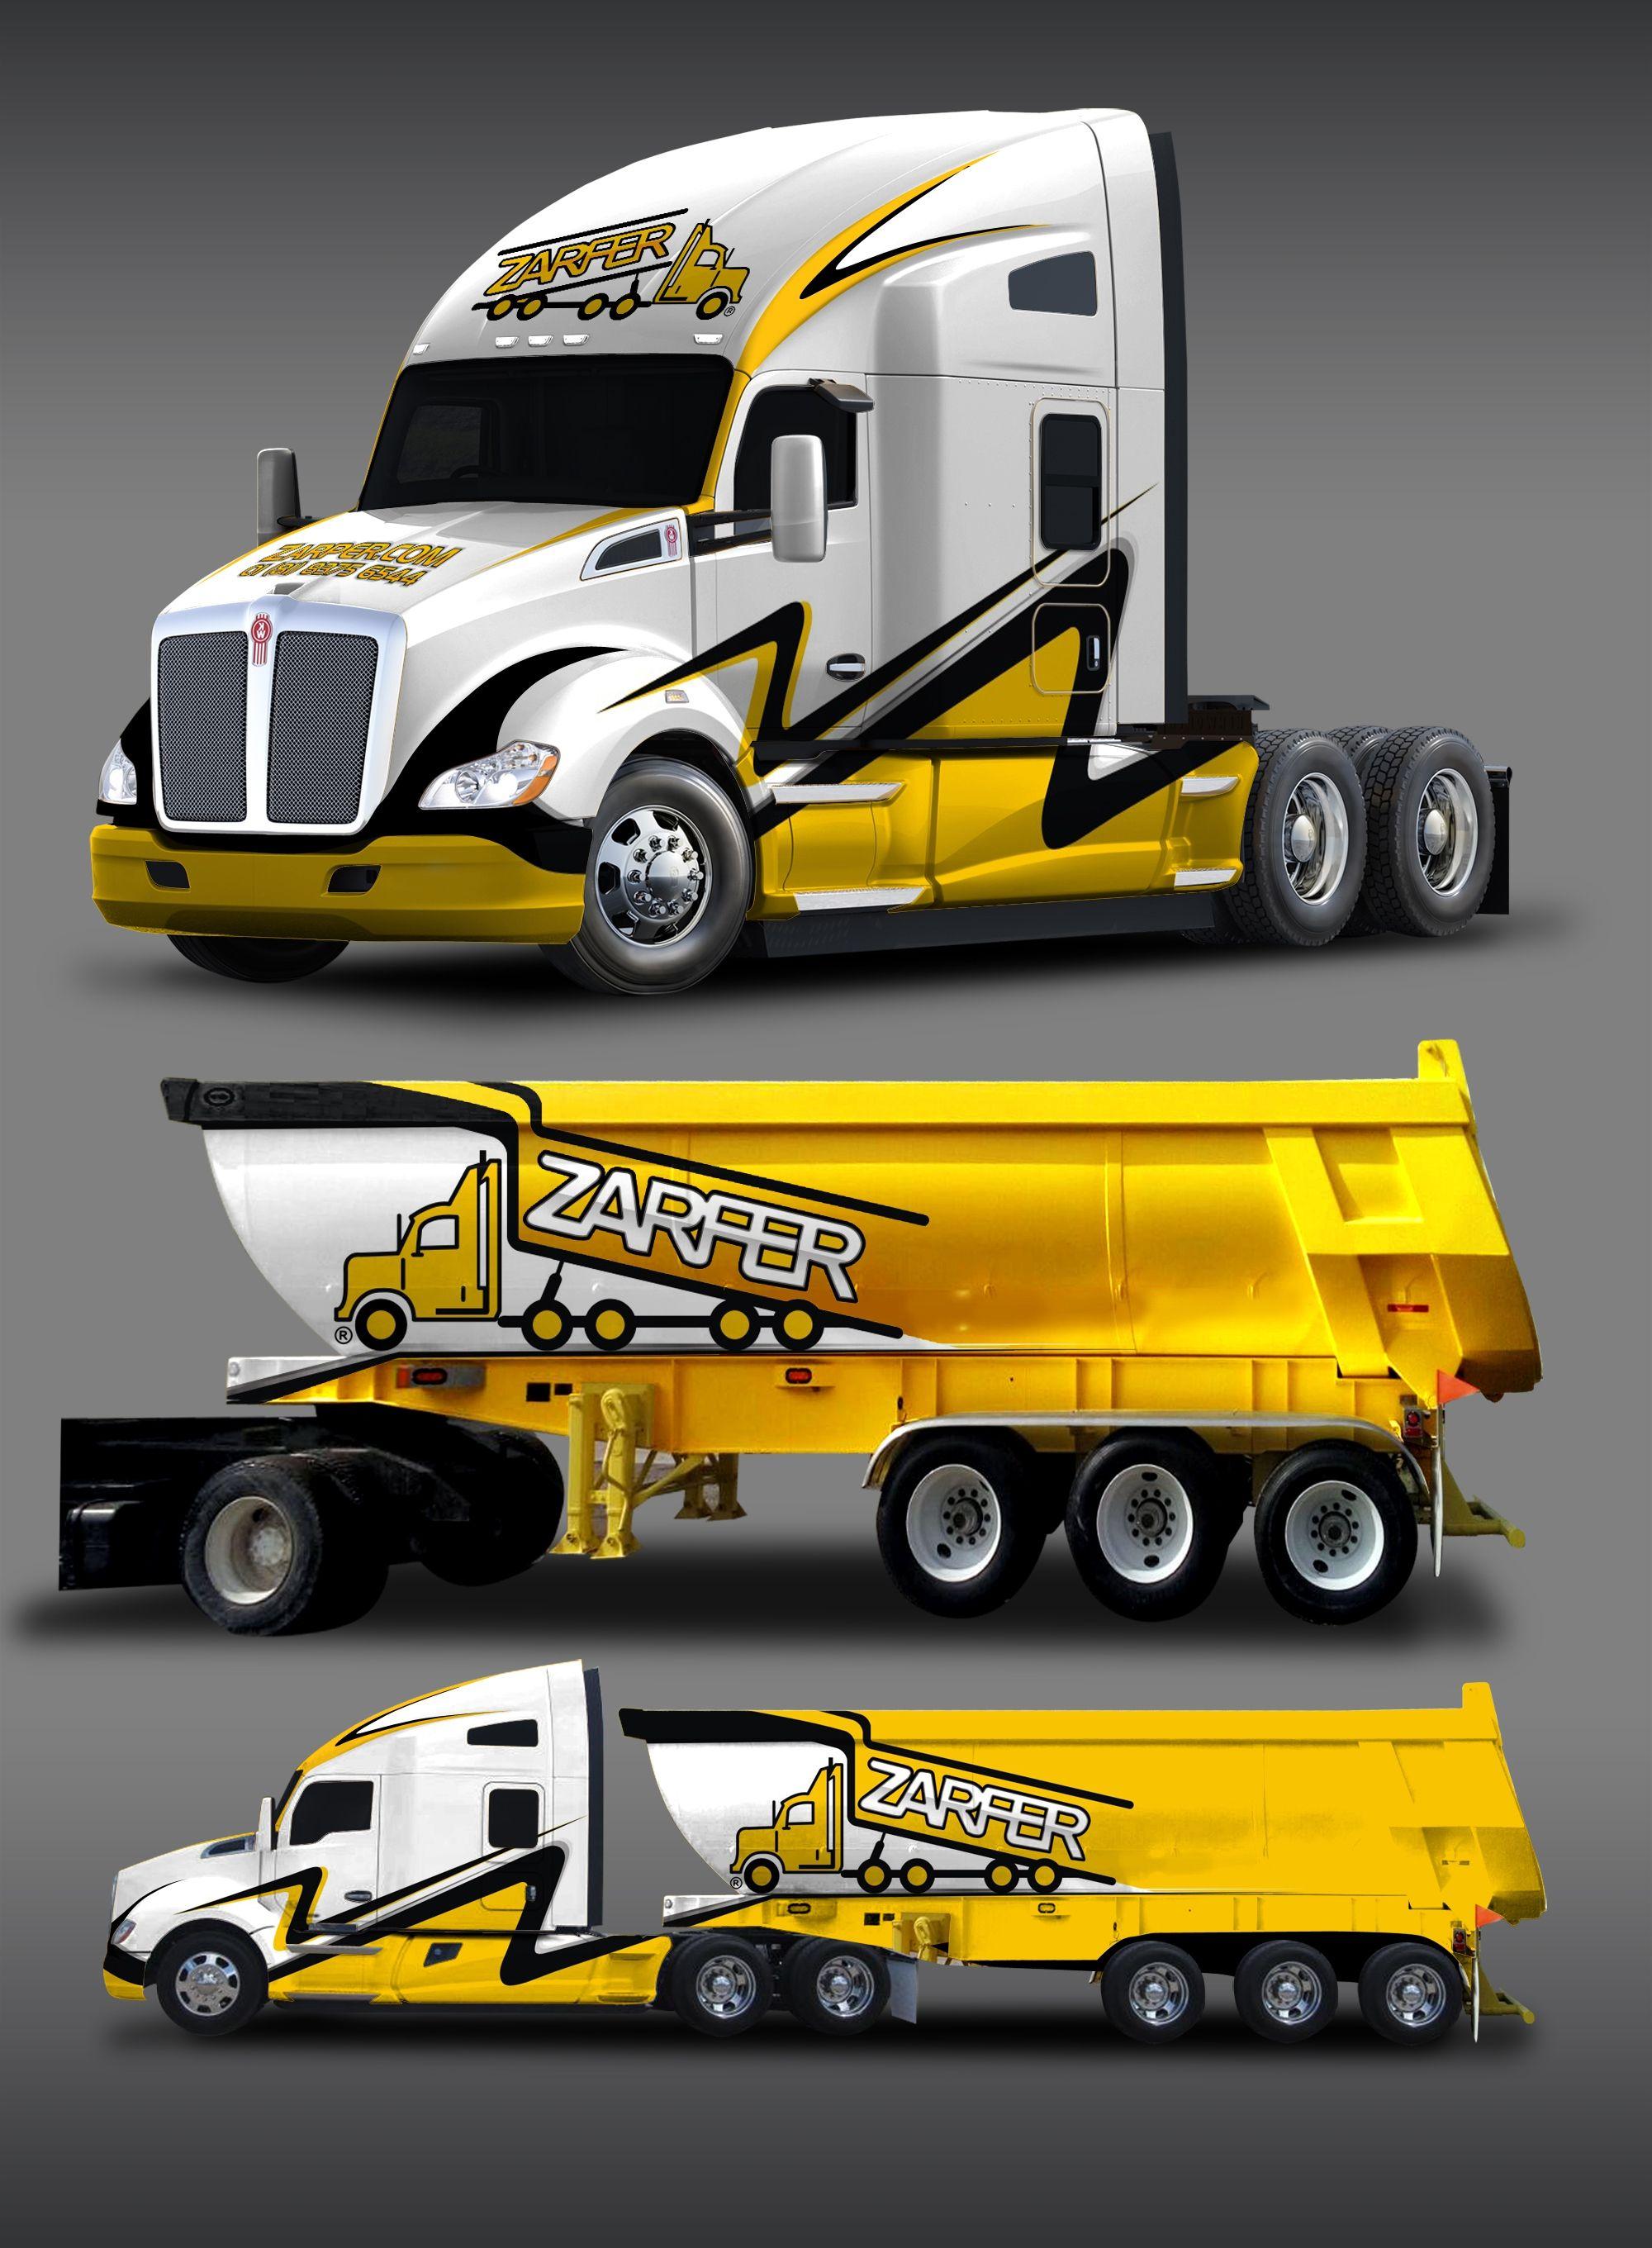 Design car contest - Designs Make A New Design For Zarfer Trucks Car Truck Or Van